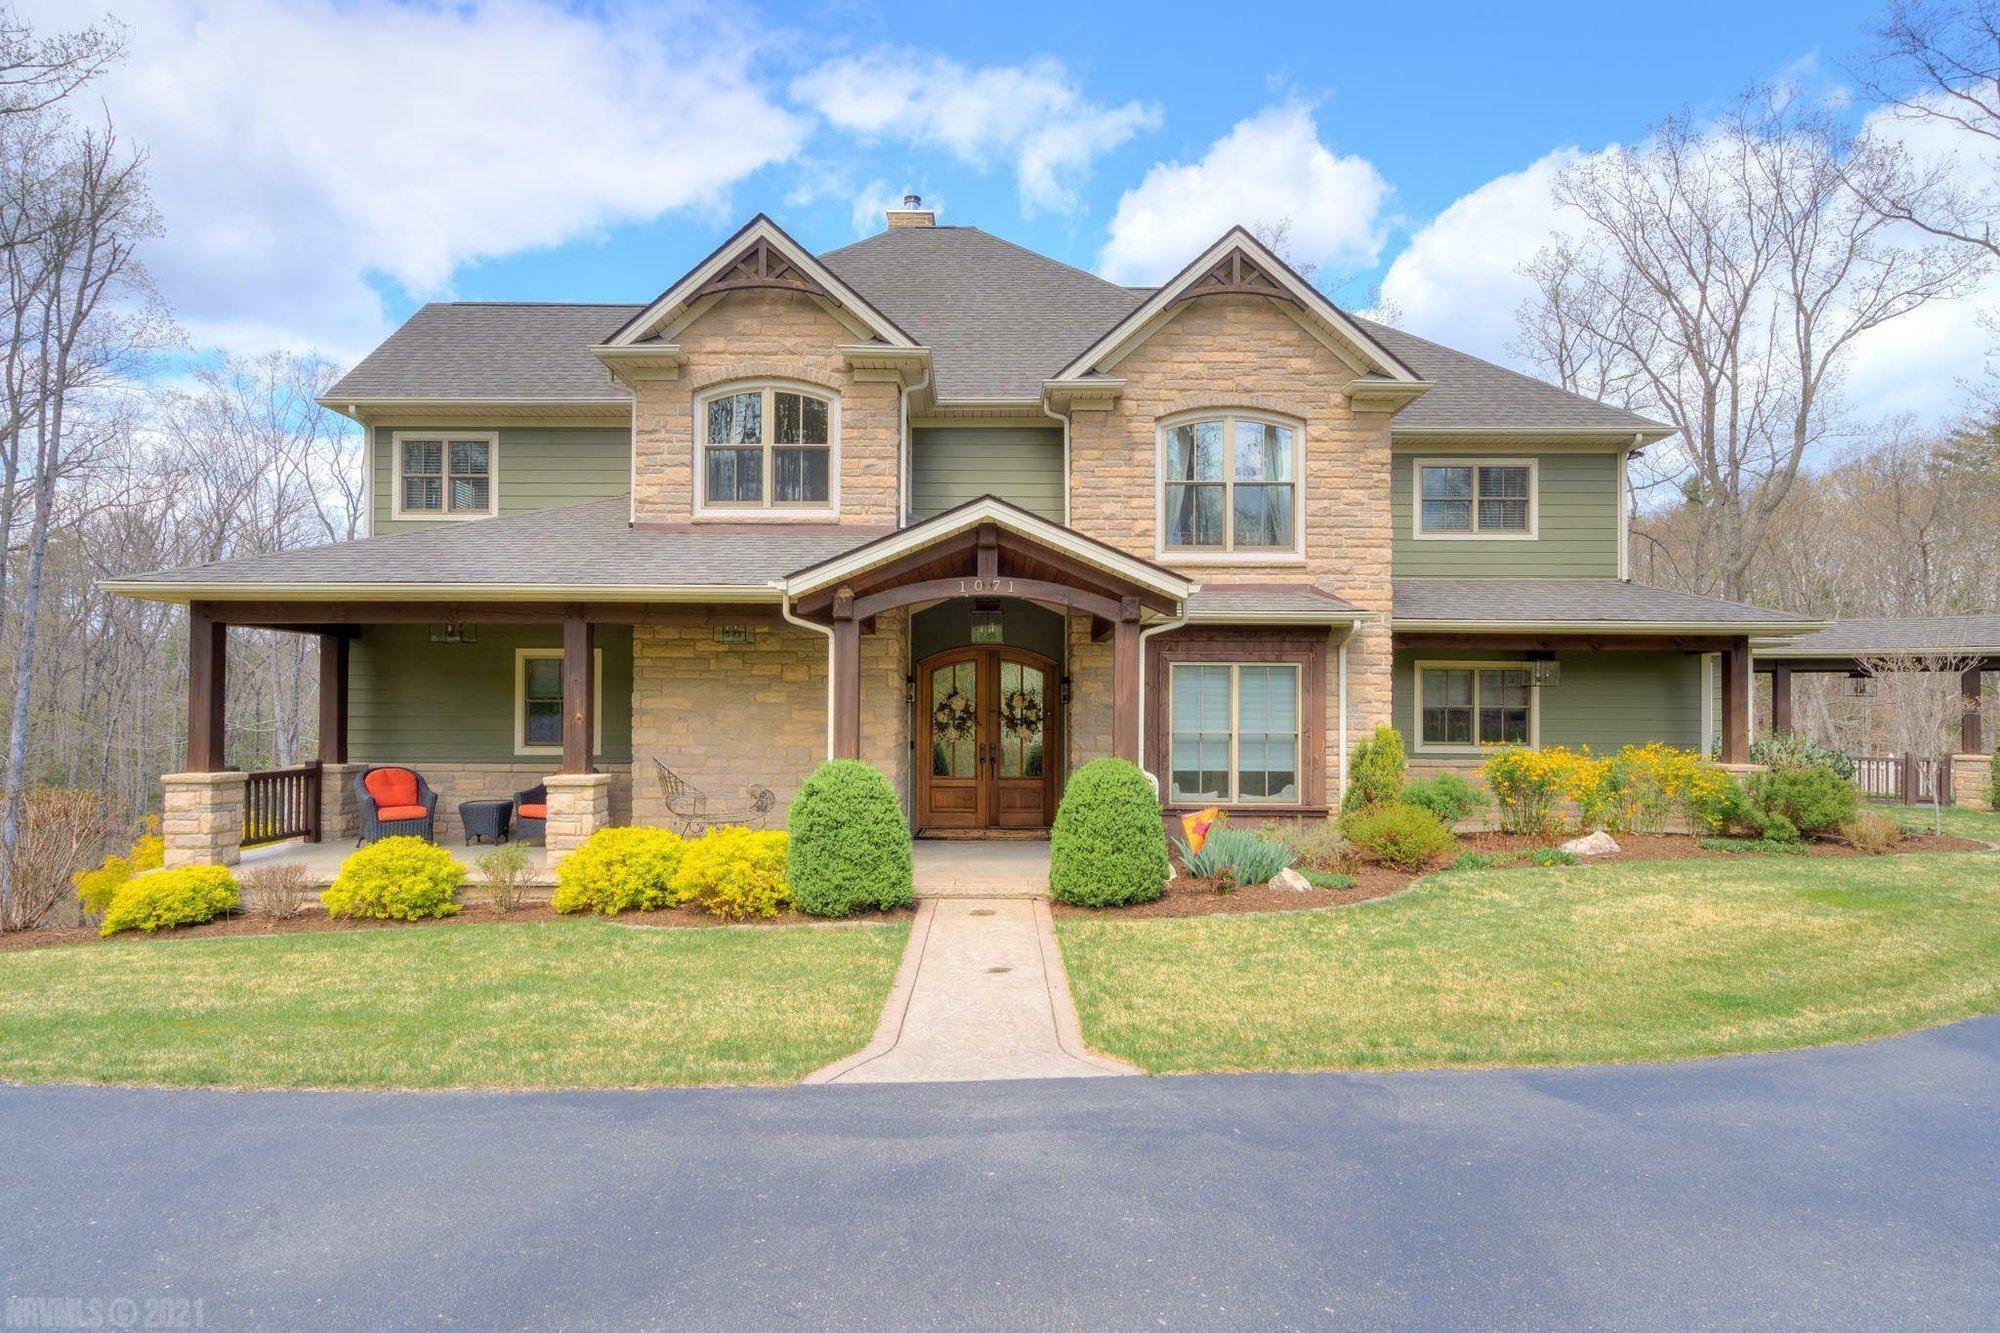 Casa a Blacksburg, Virginia, Stati Uniti 1 - 11429889